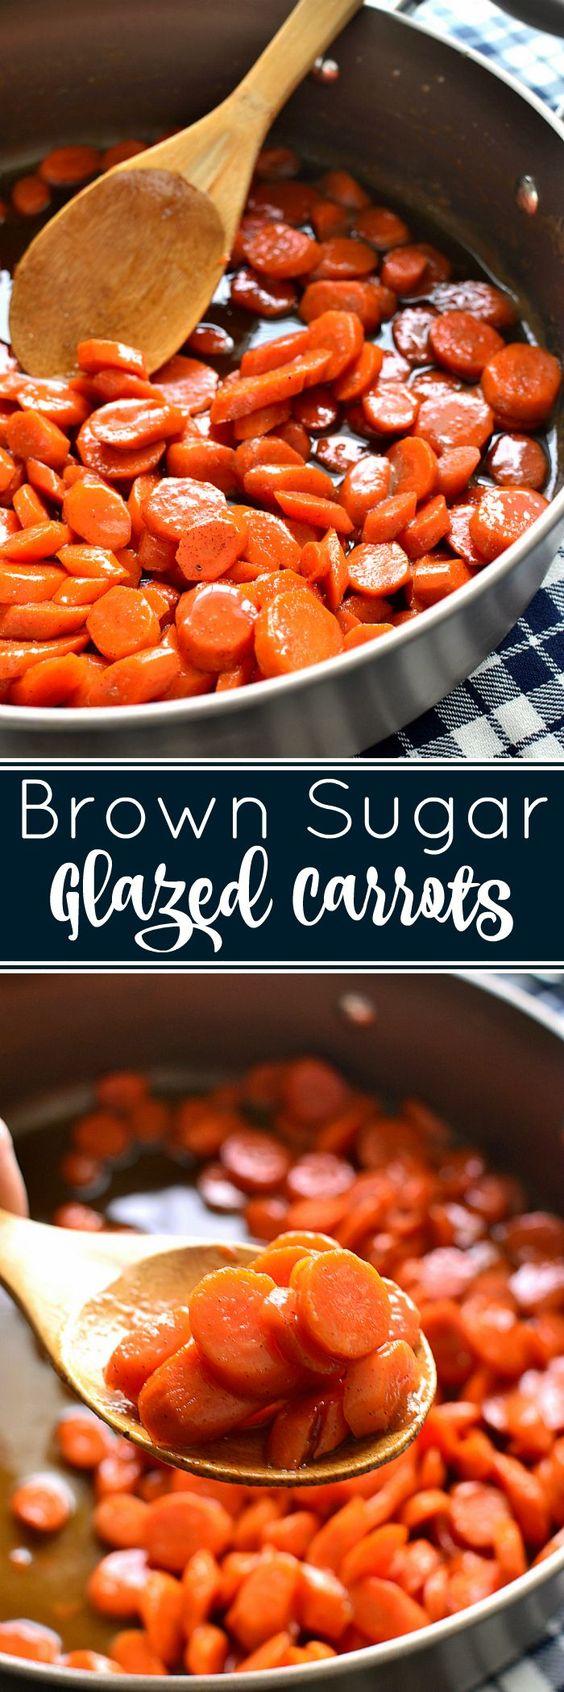 Brown Sugar-Glazed Carrots.